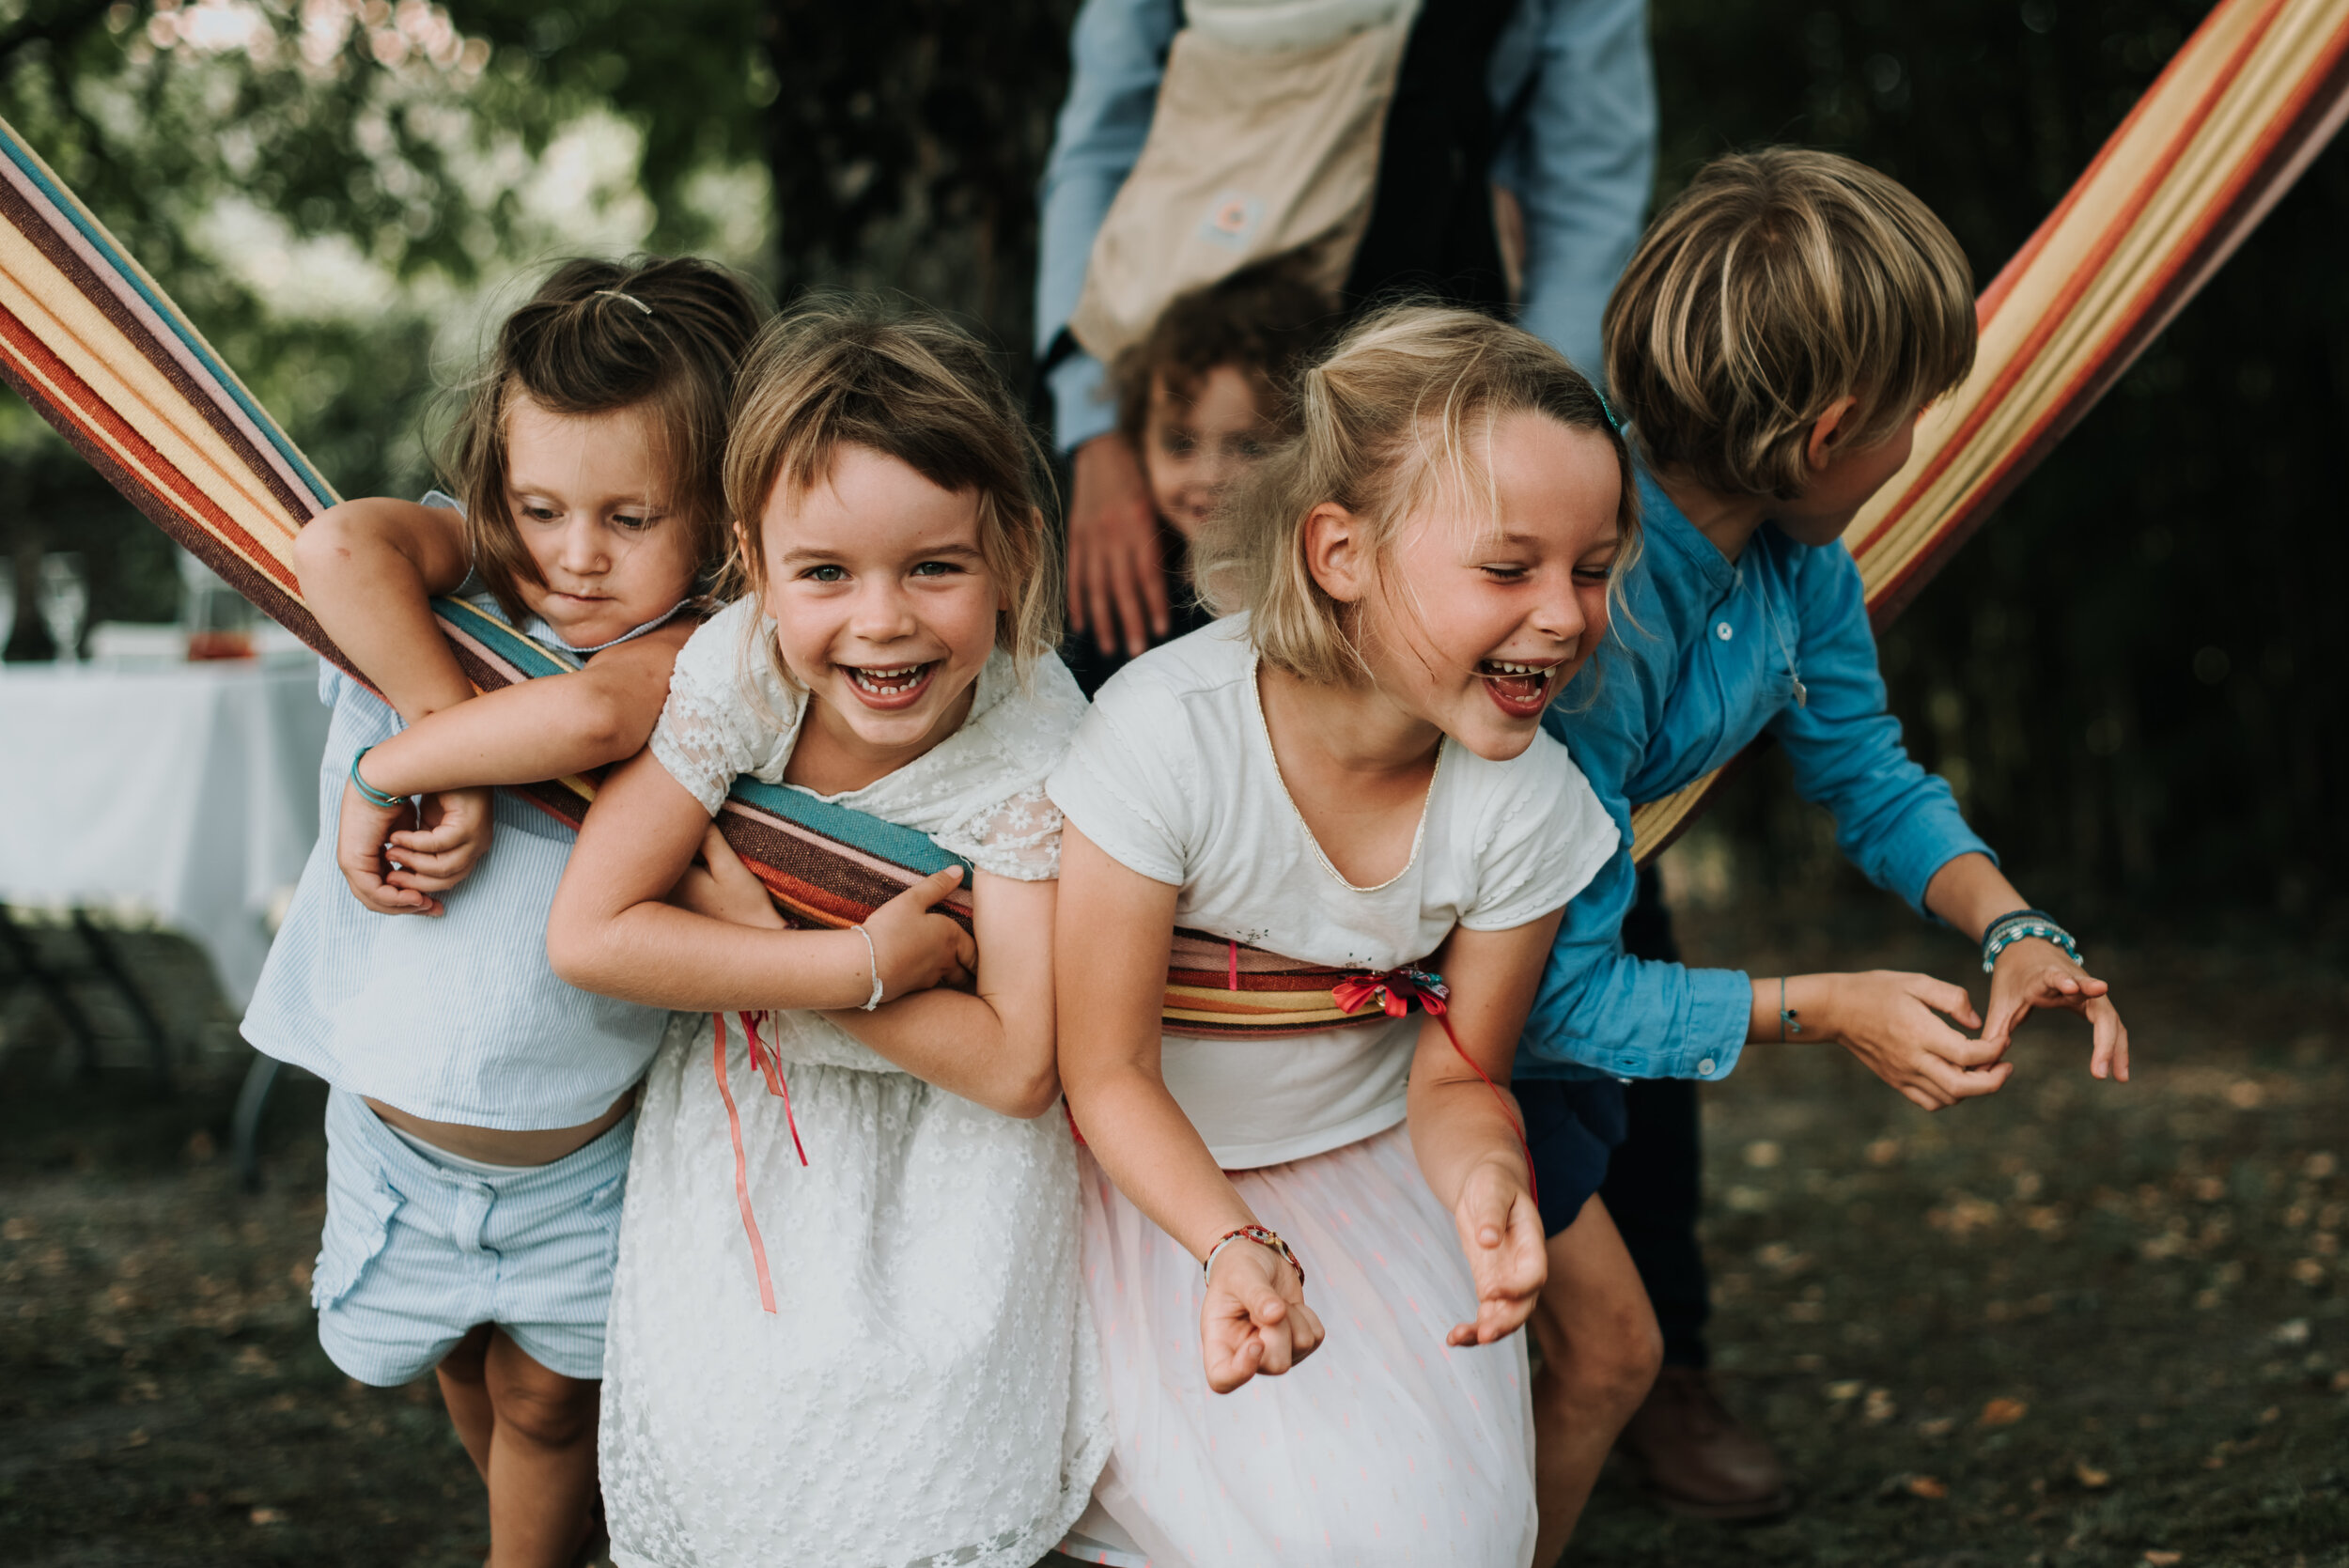 Léa-Fery-Photographe-Bretagne-Mariage-Famille-0490.jpg